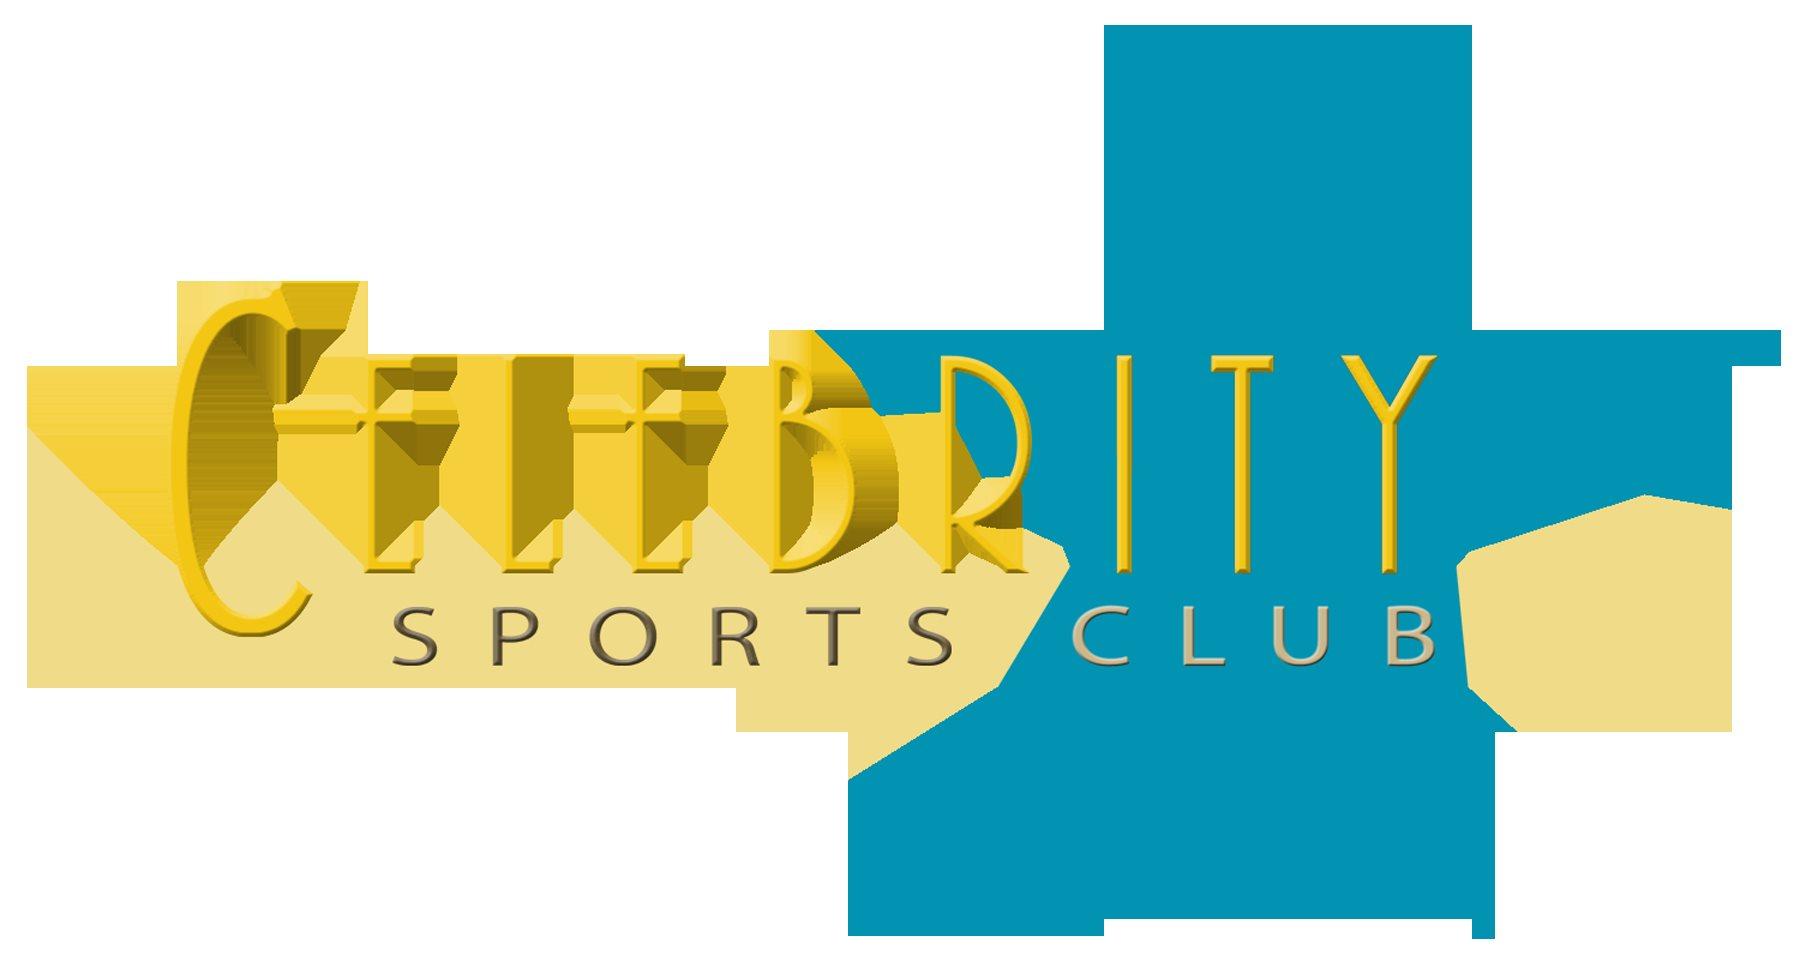 Celebrity Sports Plaza, Inc.